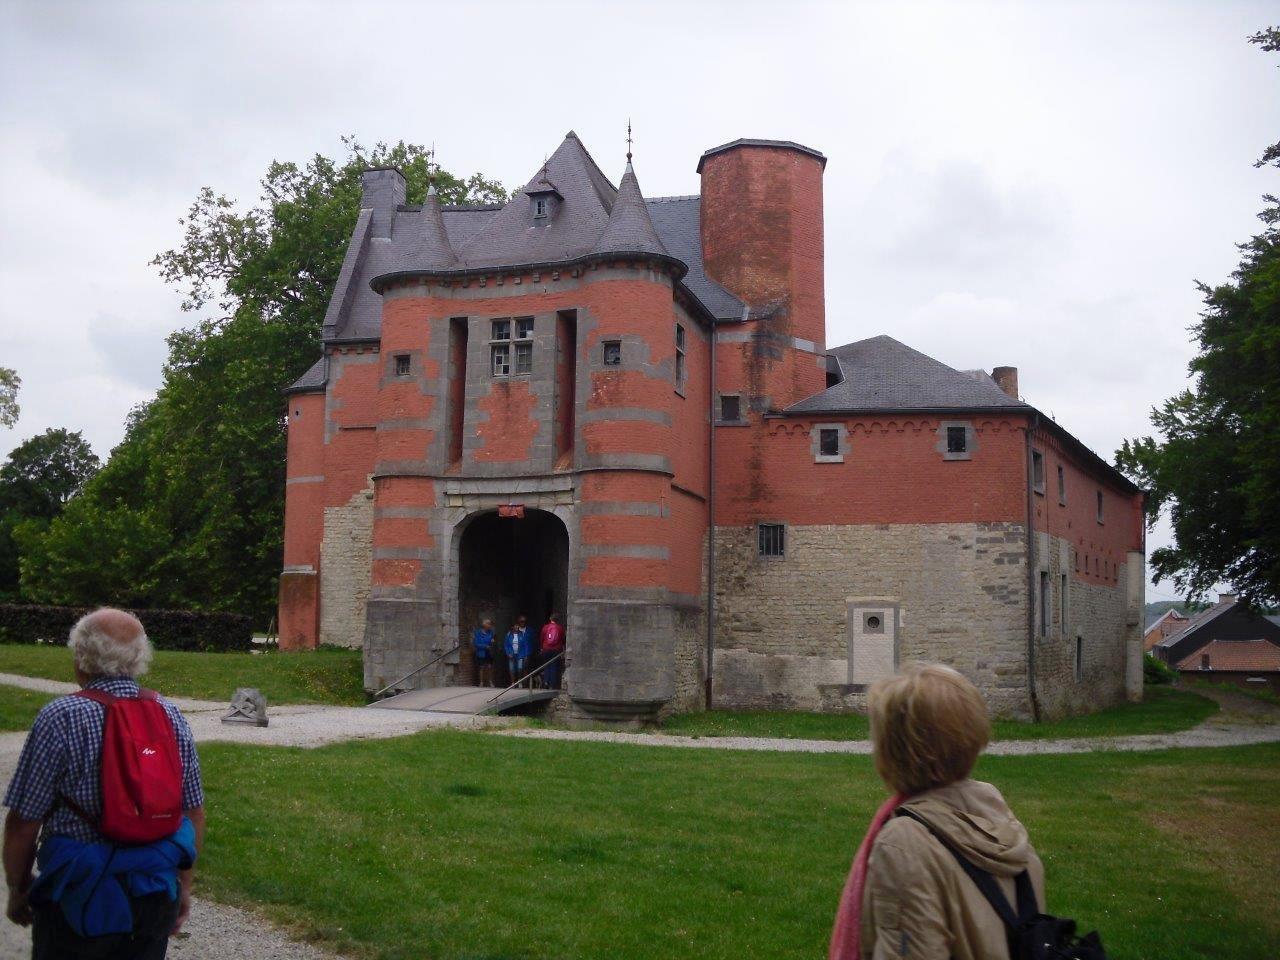 Wandelentocht-Forchies-La-Marche-op-7-07-2019.-3